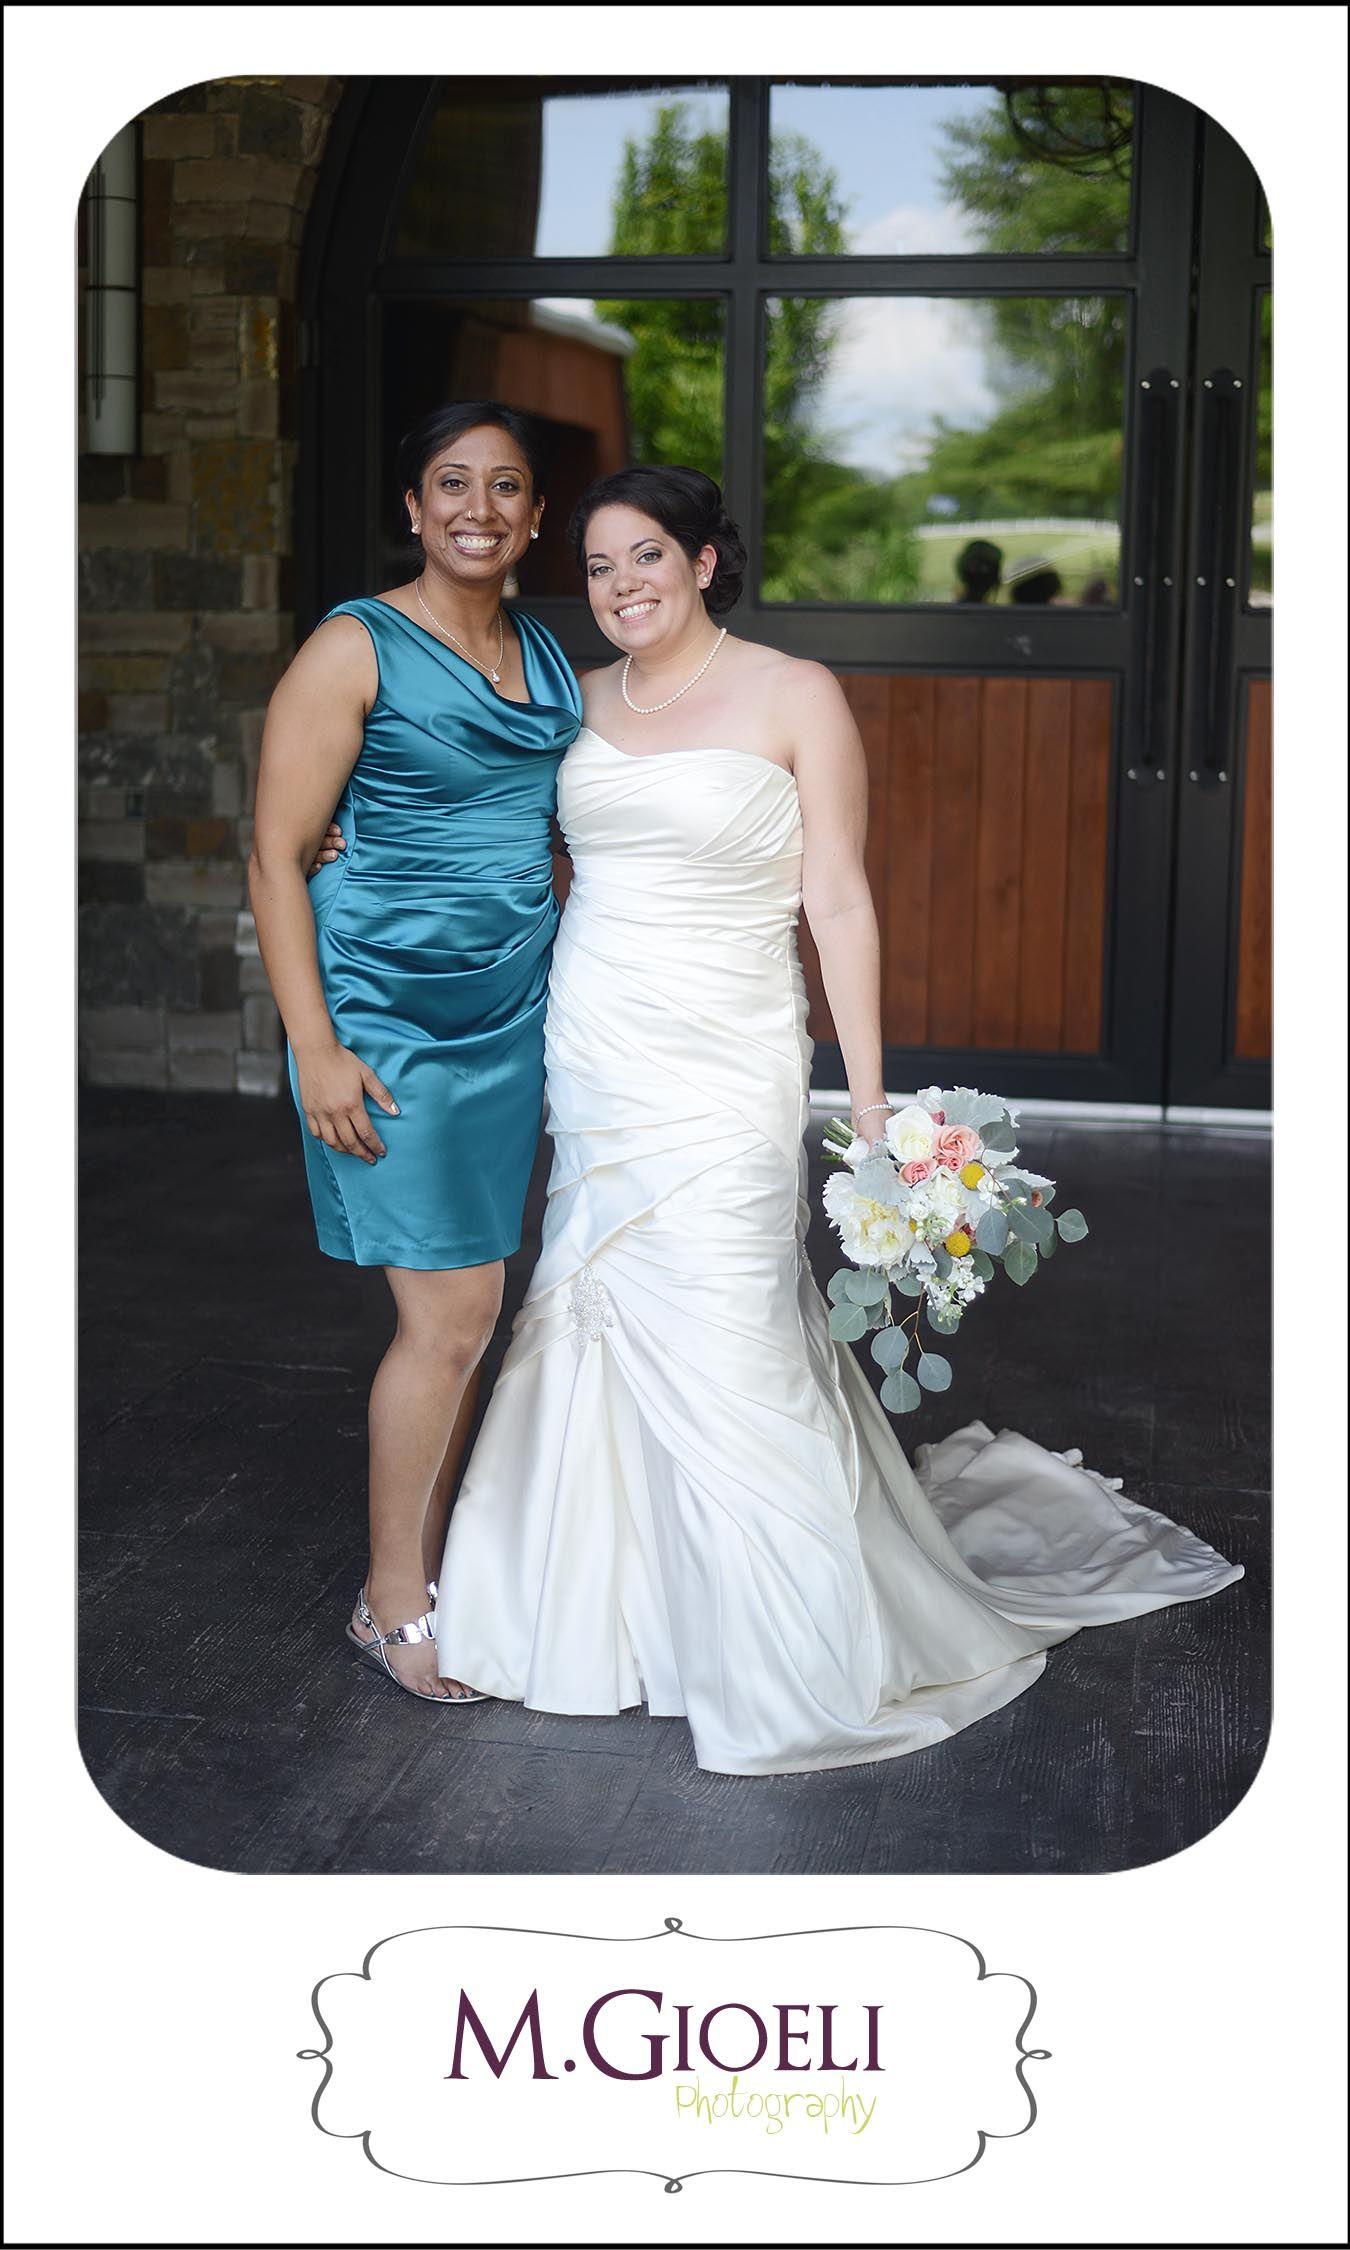 Mgioeliphotography Wedding Photography Winston M Nc Photographer Adaumont Farms Trinity